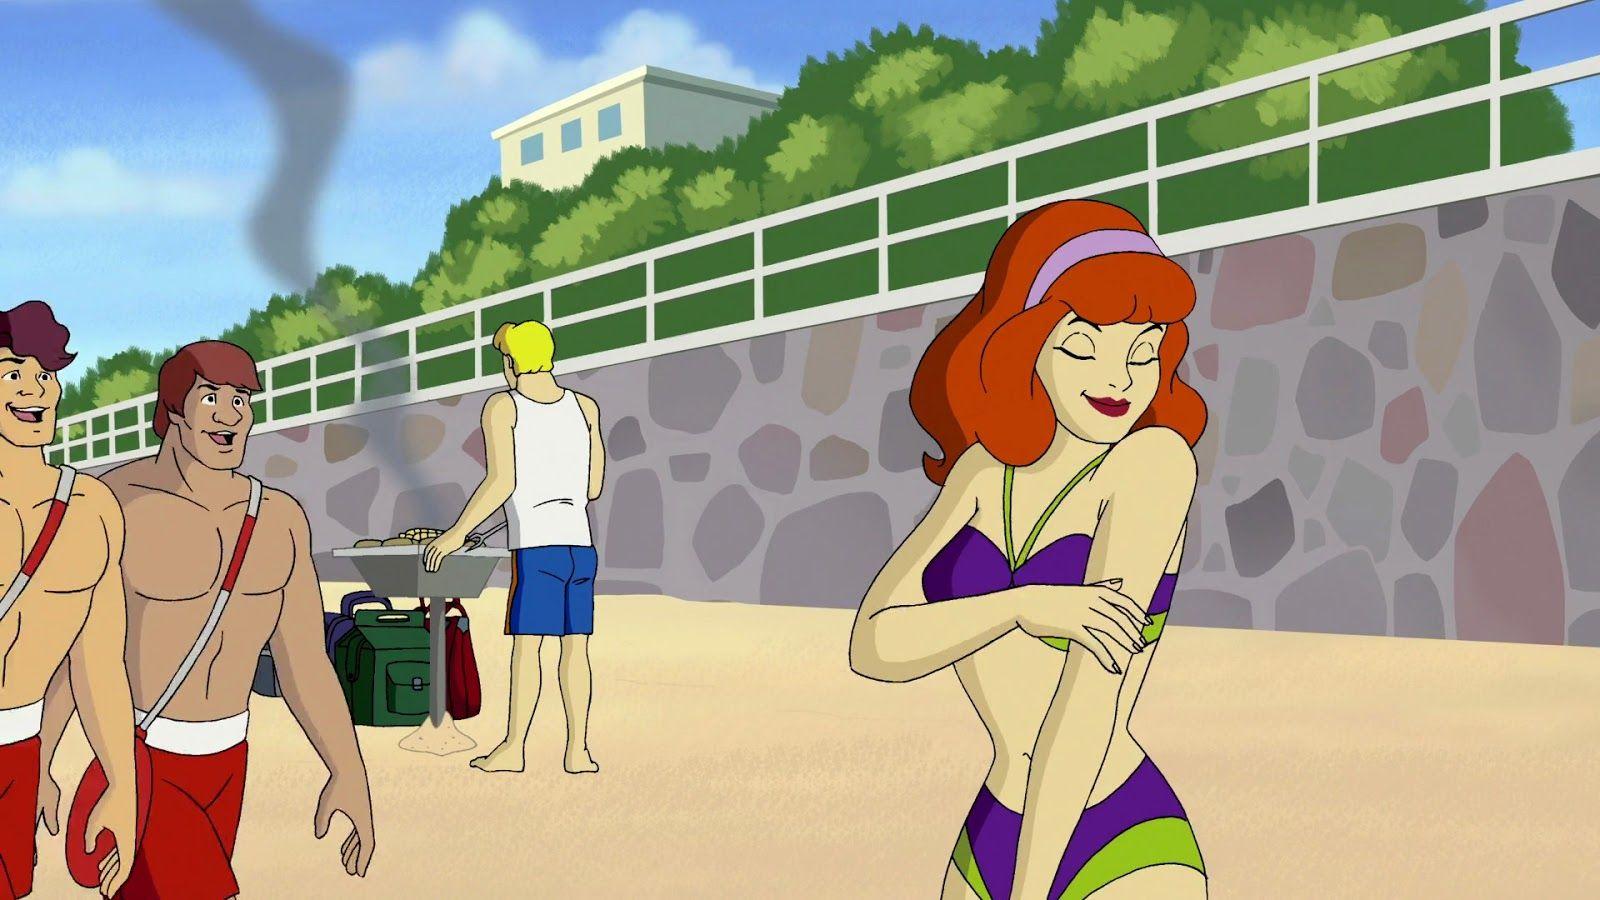 Daphne Blake Daphne Blake Bikini Daphne Blake Scooby